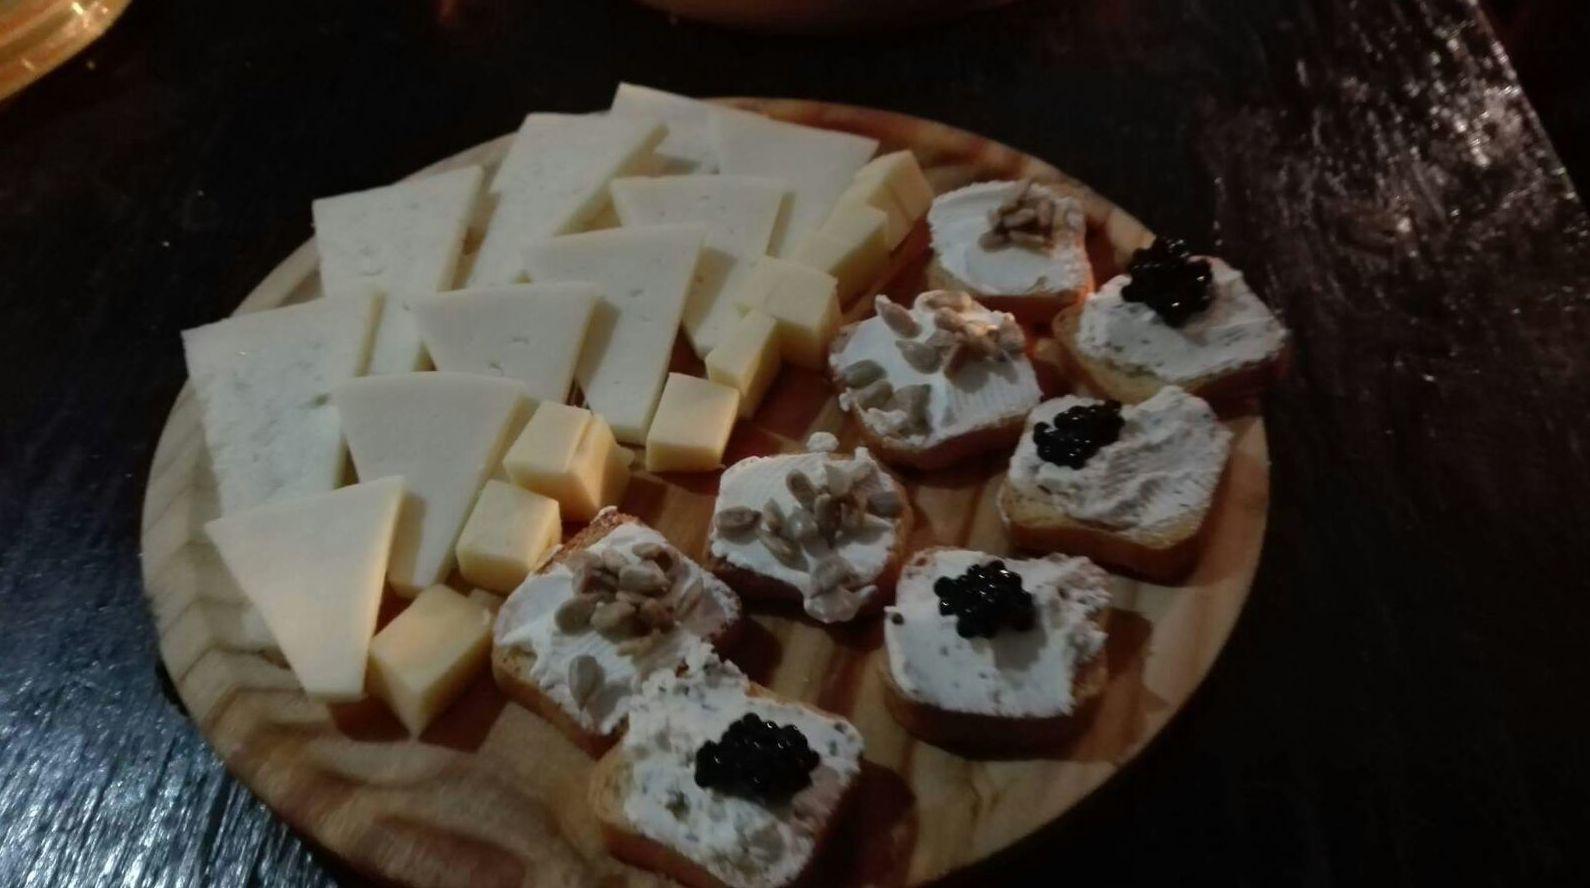 Cena con espectáculo en Cádiz/tablao flamenco y cena en cádiz